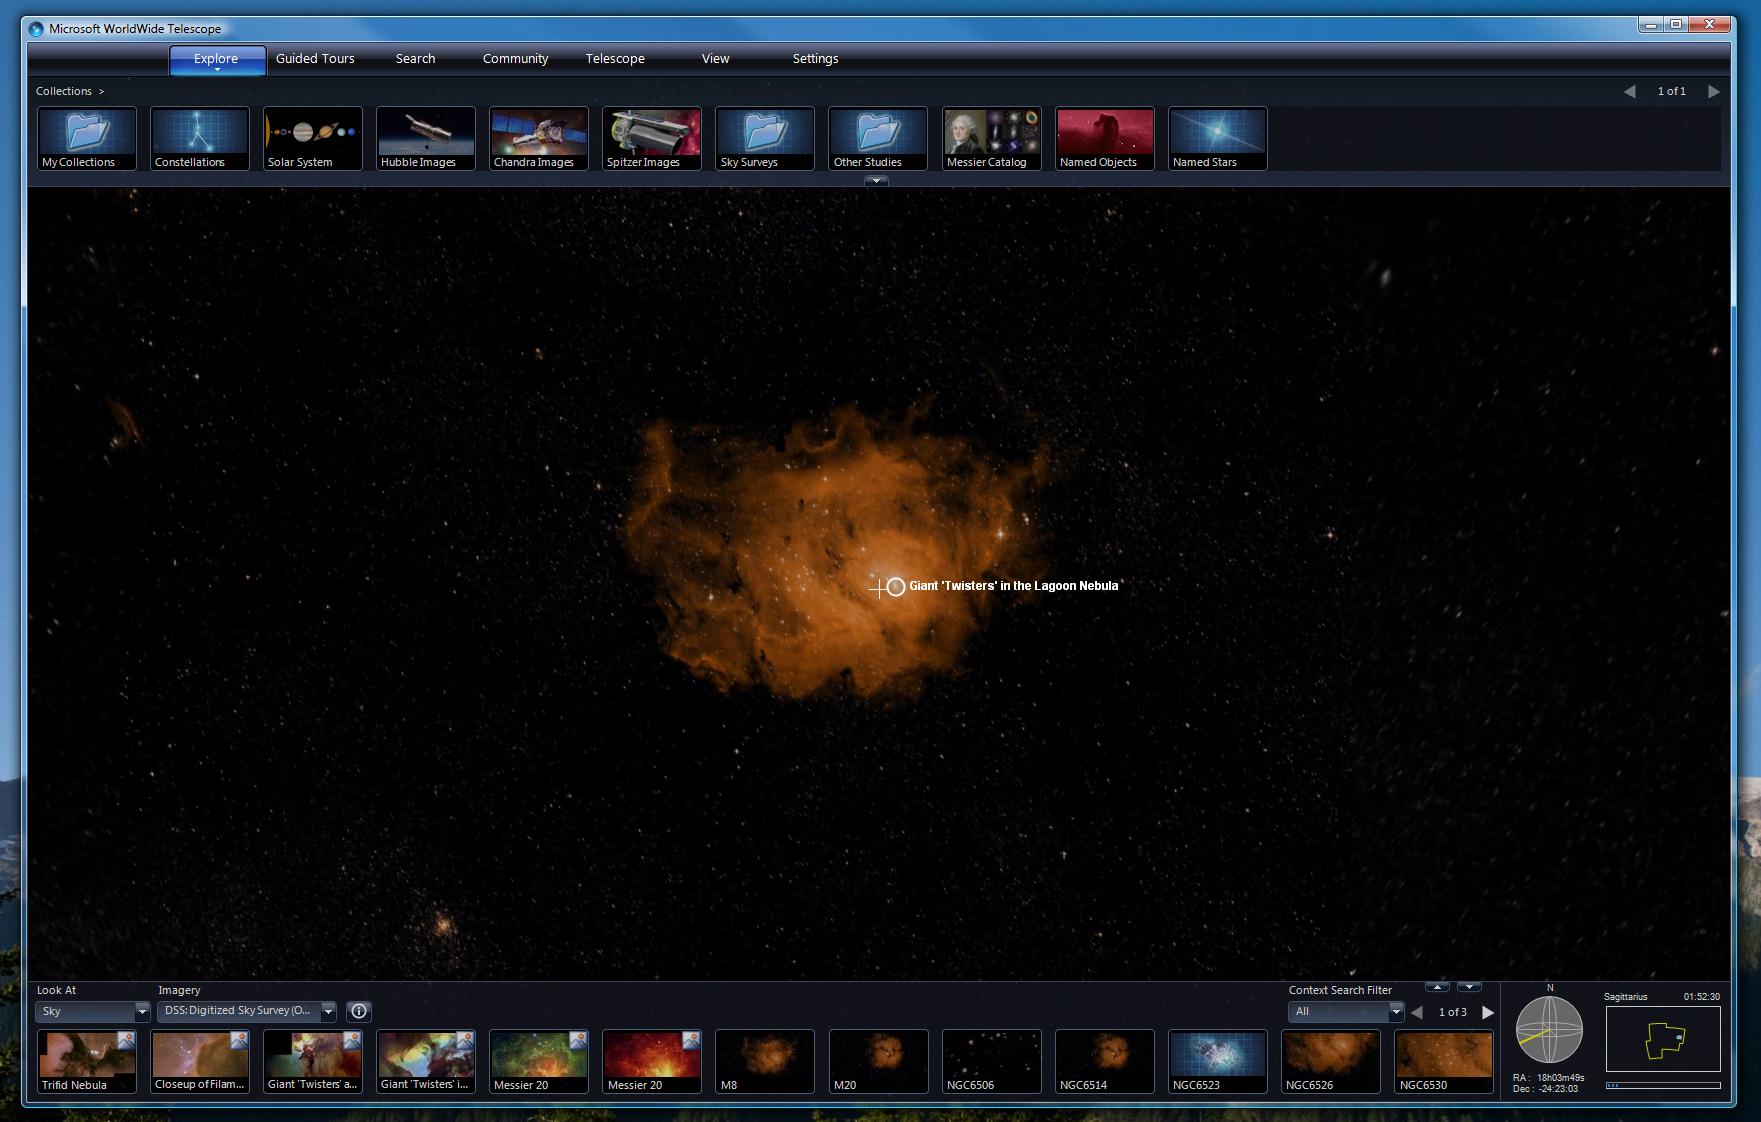 Microsoft WorldWide Telescope